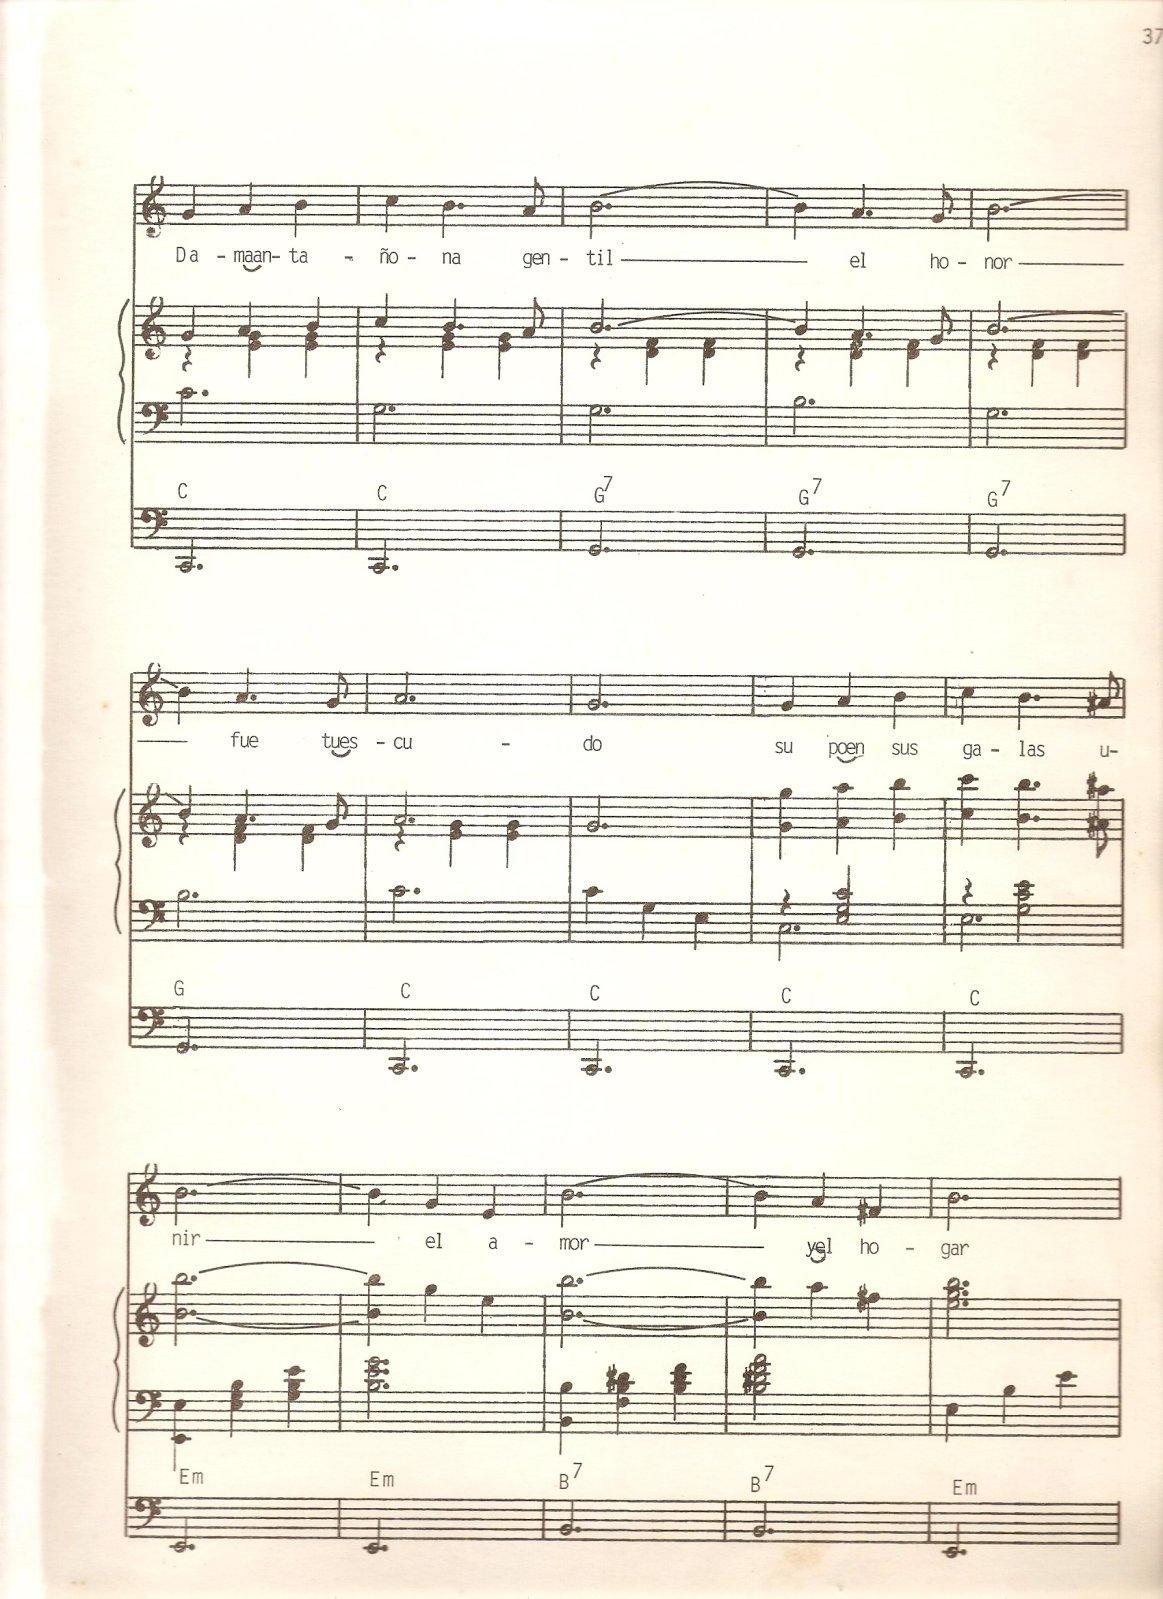 partituras - [Partituras] | Francisco de Paula Aguirre - Dama Antañona 2n9xt8i